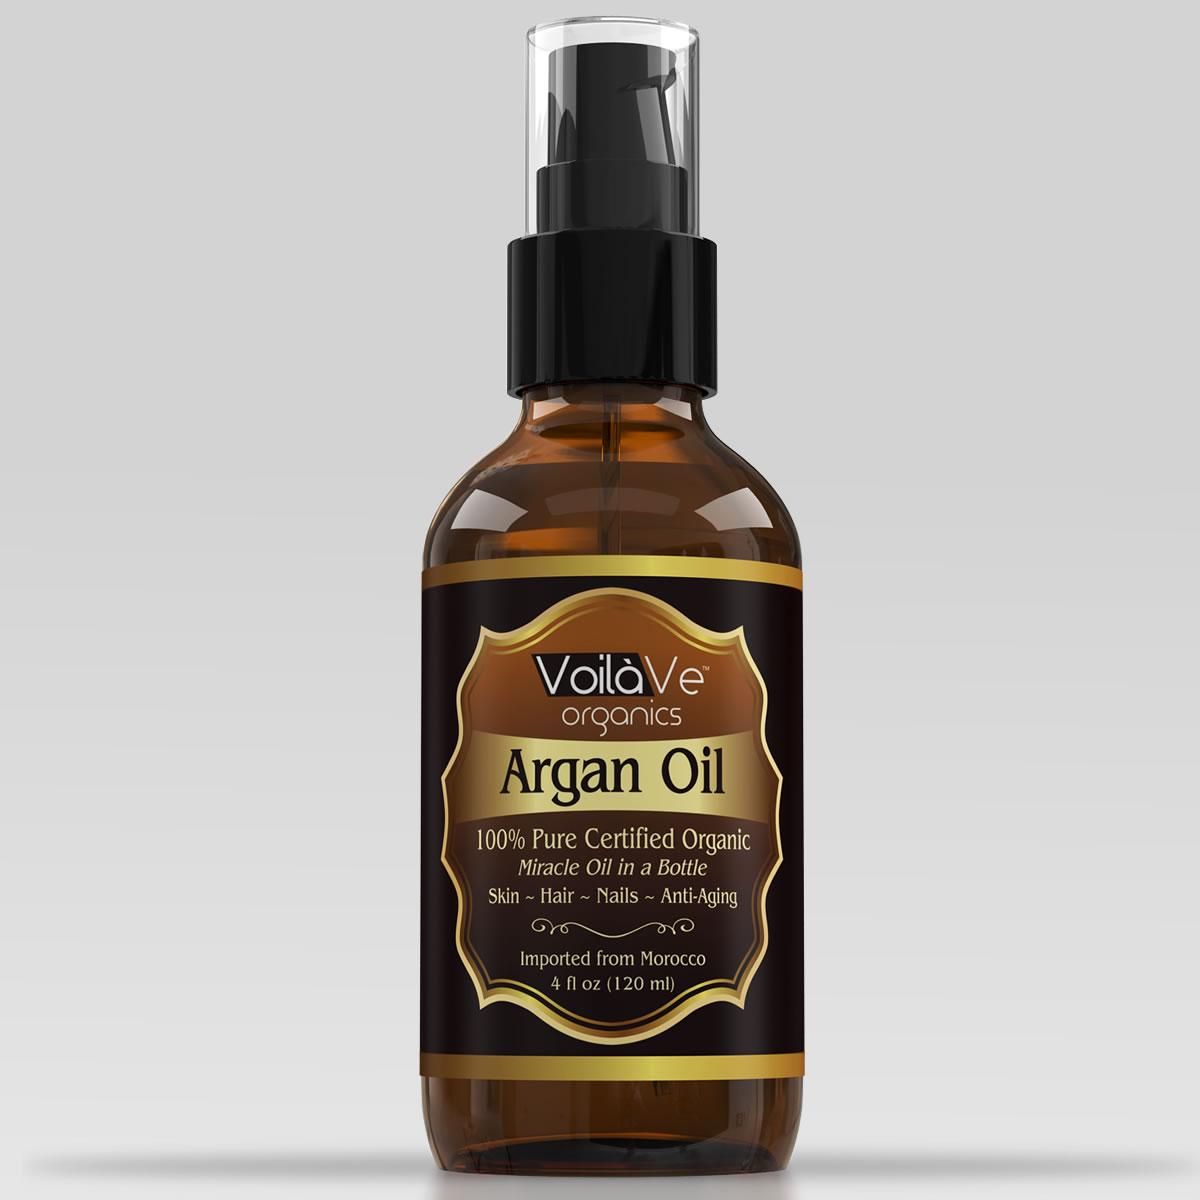 Argon oil reviews